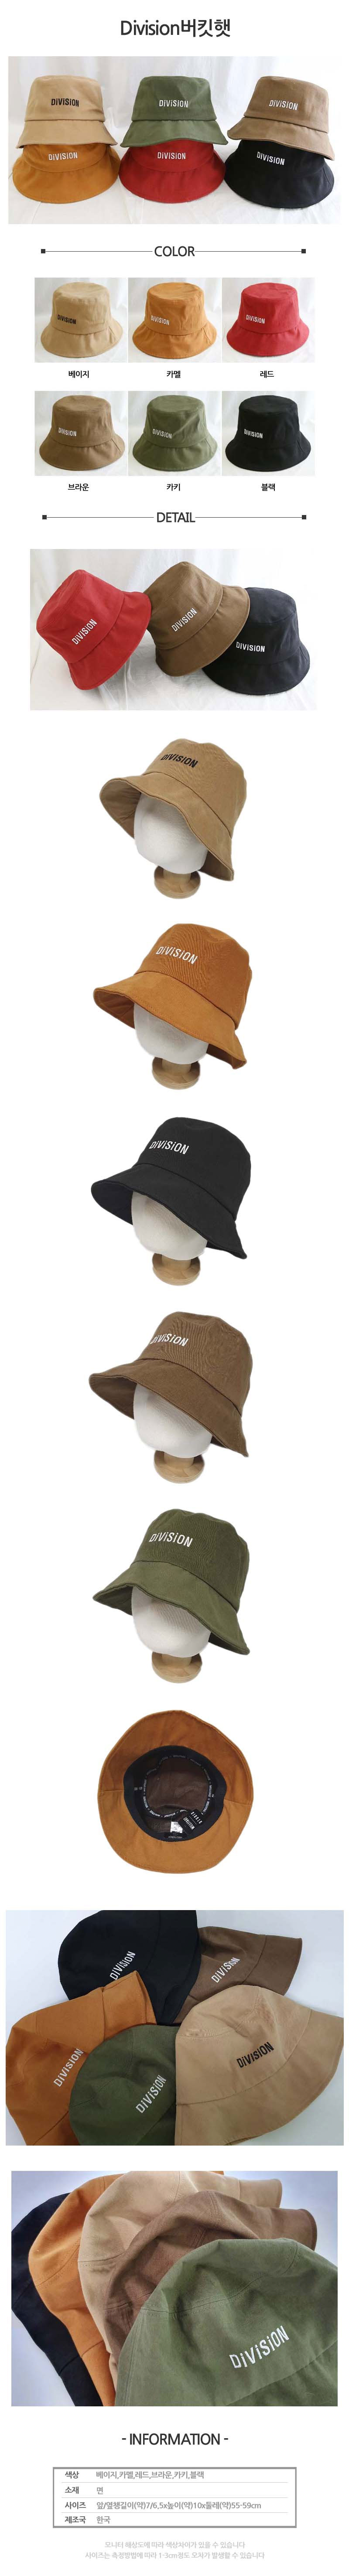 Division 버킷햇 벙거지모자CH1489646 - 익스트리모, 20,240원, 모자, 버킷햇